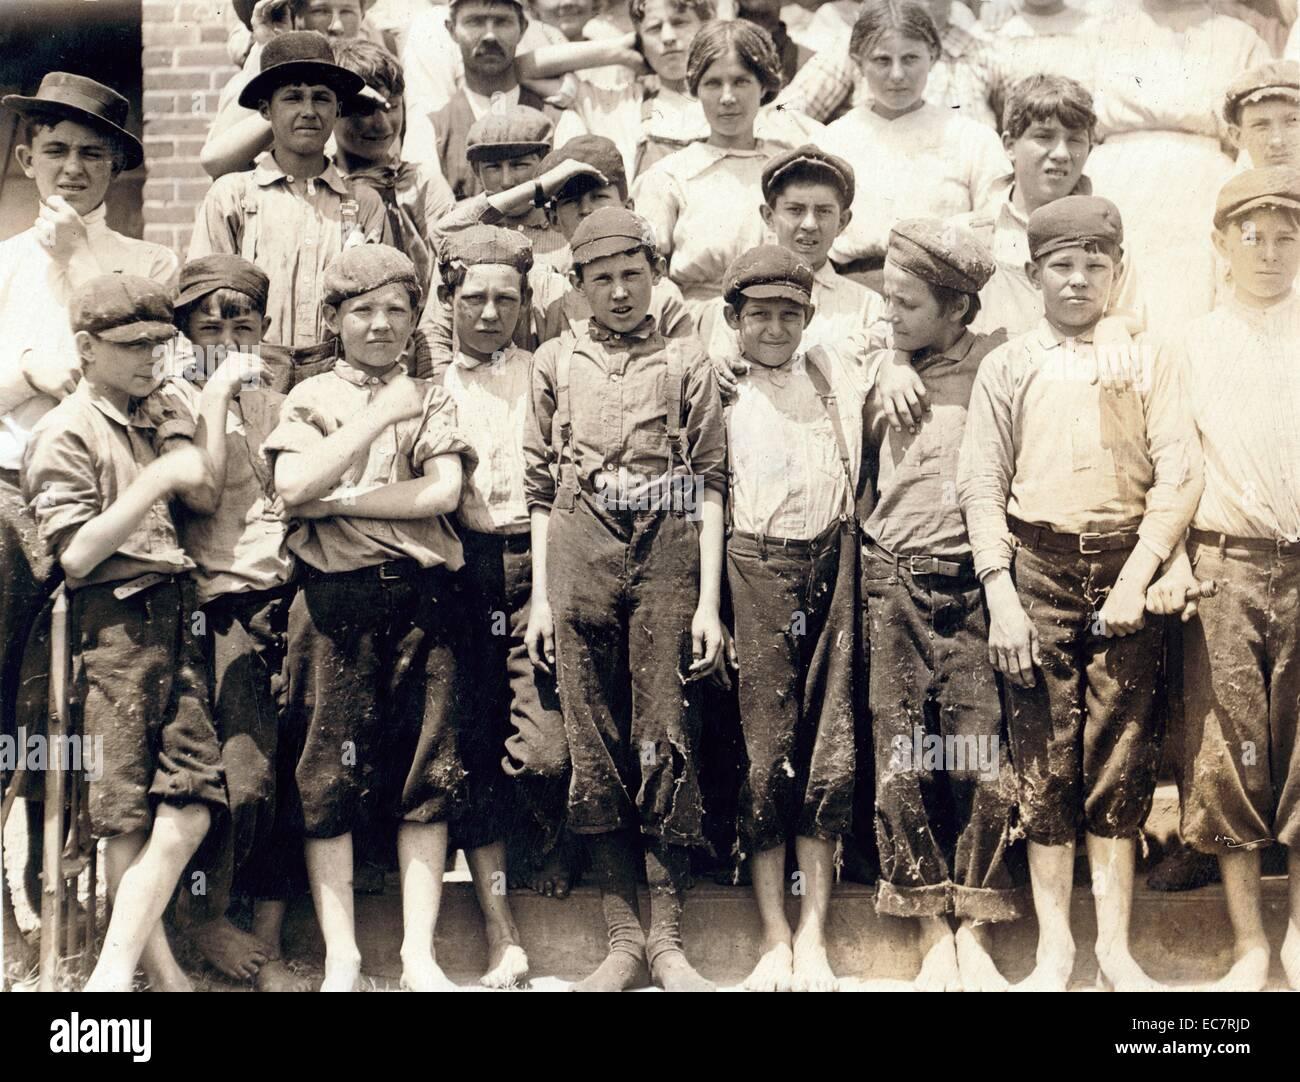 Gruppe von Kinderarbeitern in Moritas Mill; Columbus; Georgien. Stockfoto